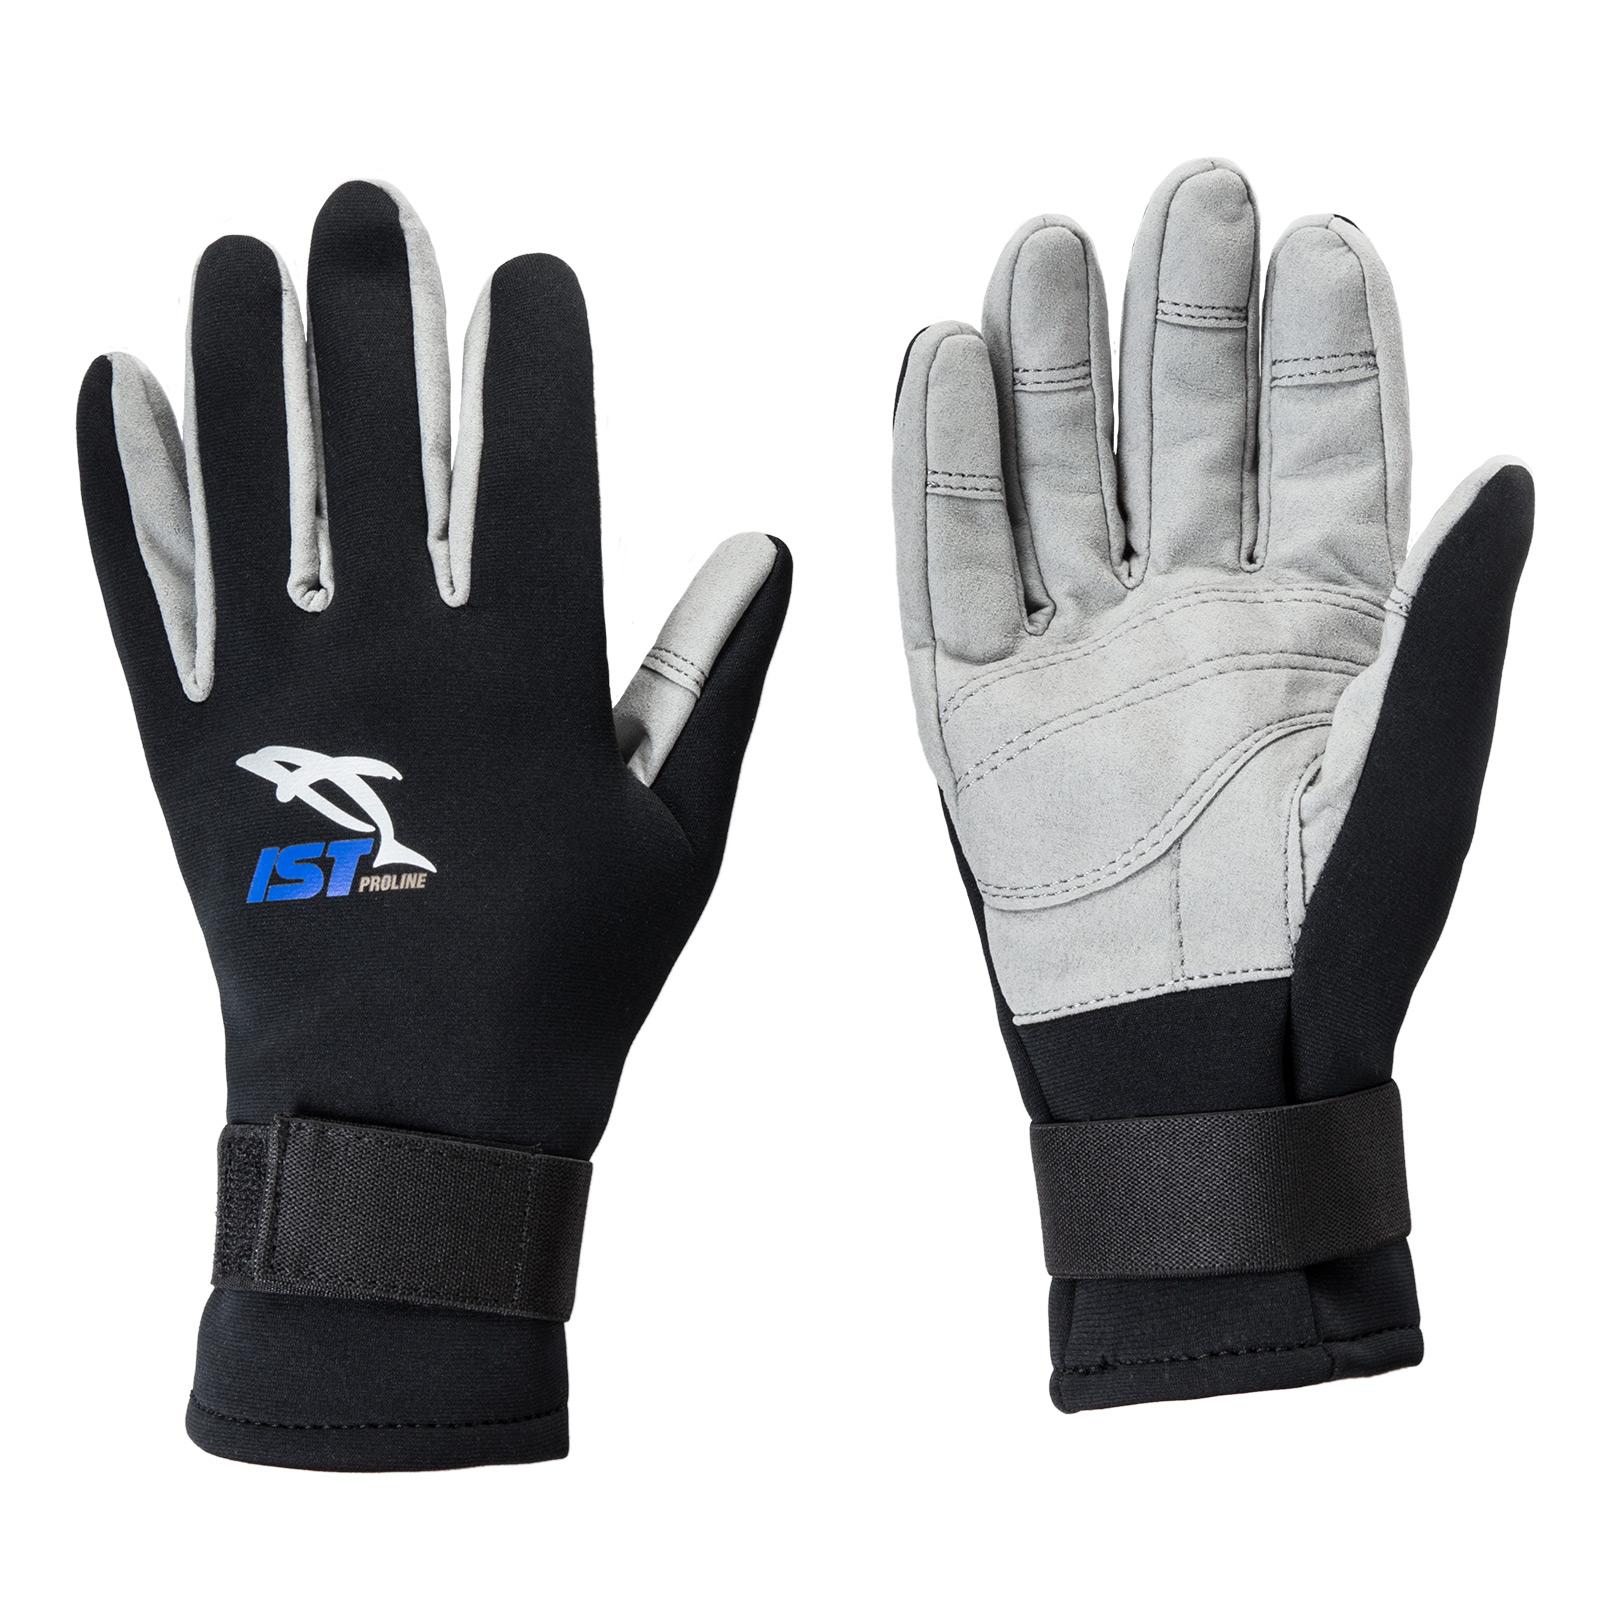 2mm Amara Leather Gloves